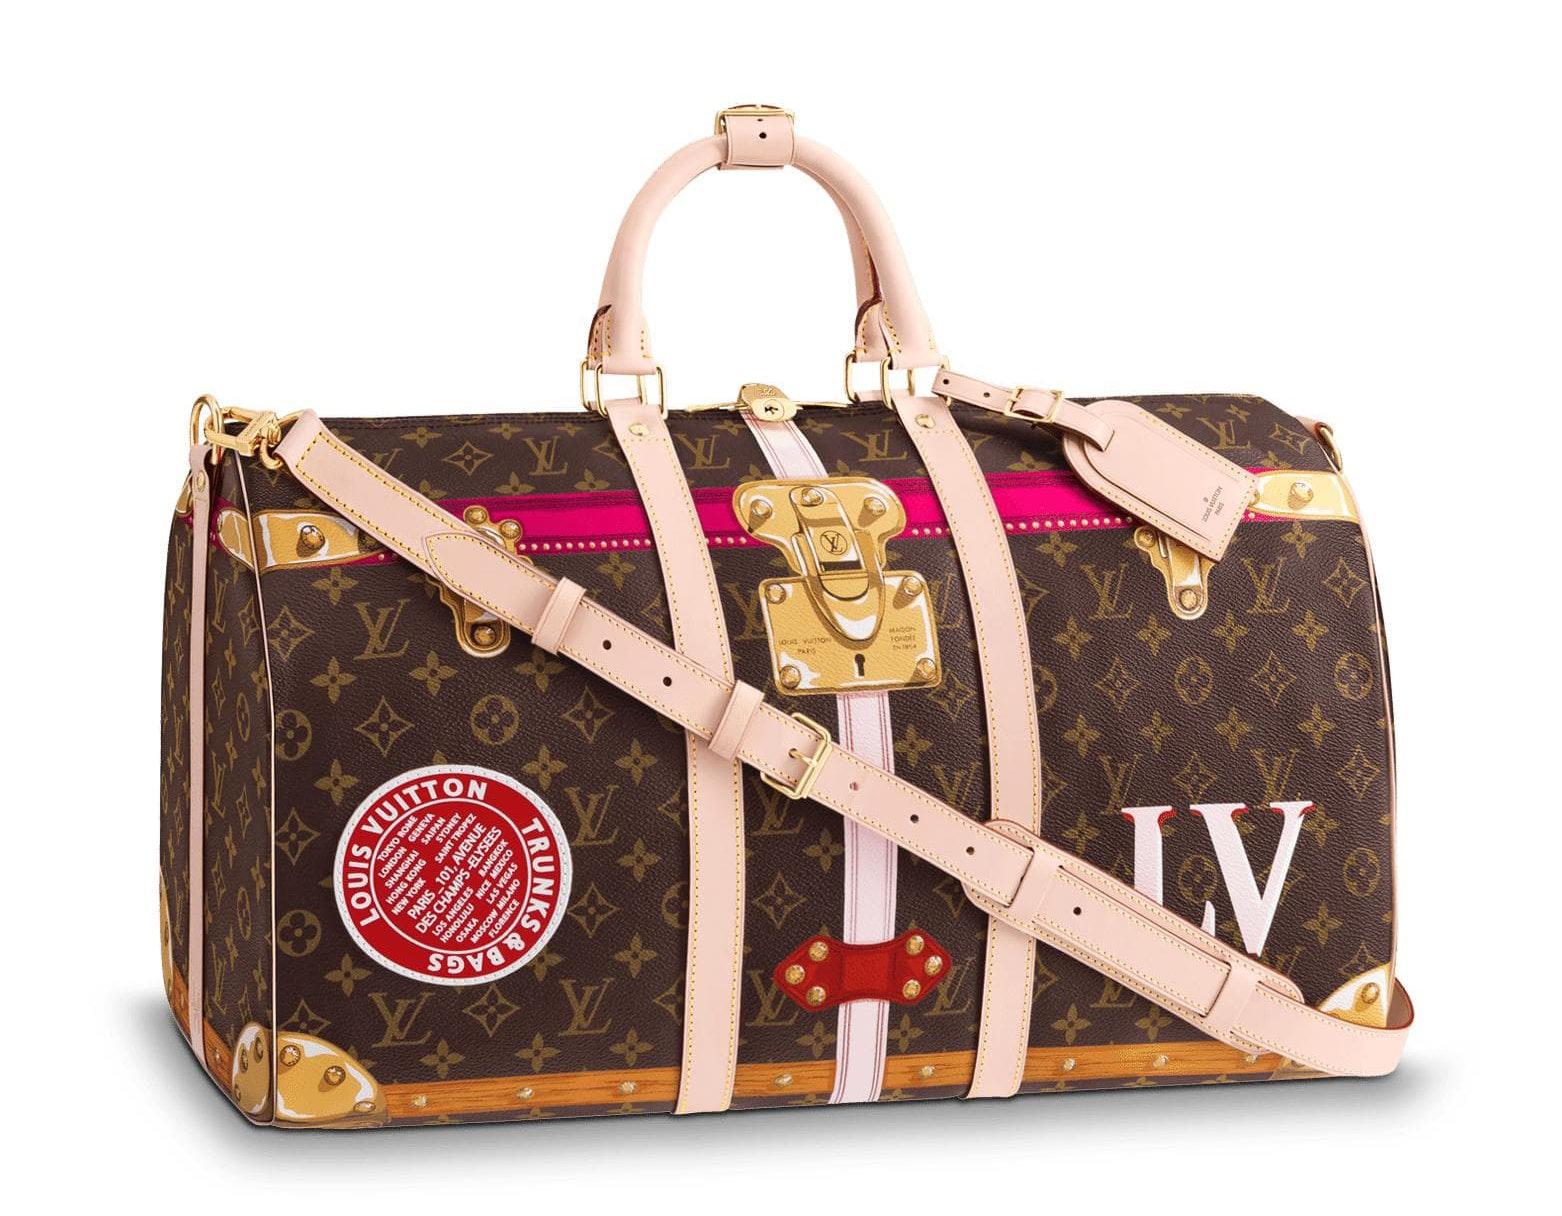 Louis Vuitton Keepall Bandouliere Monogram Summer Trunk Collection 50 Brown